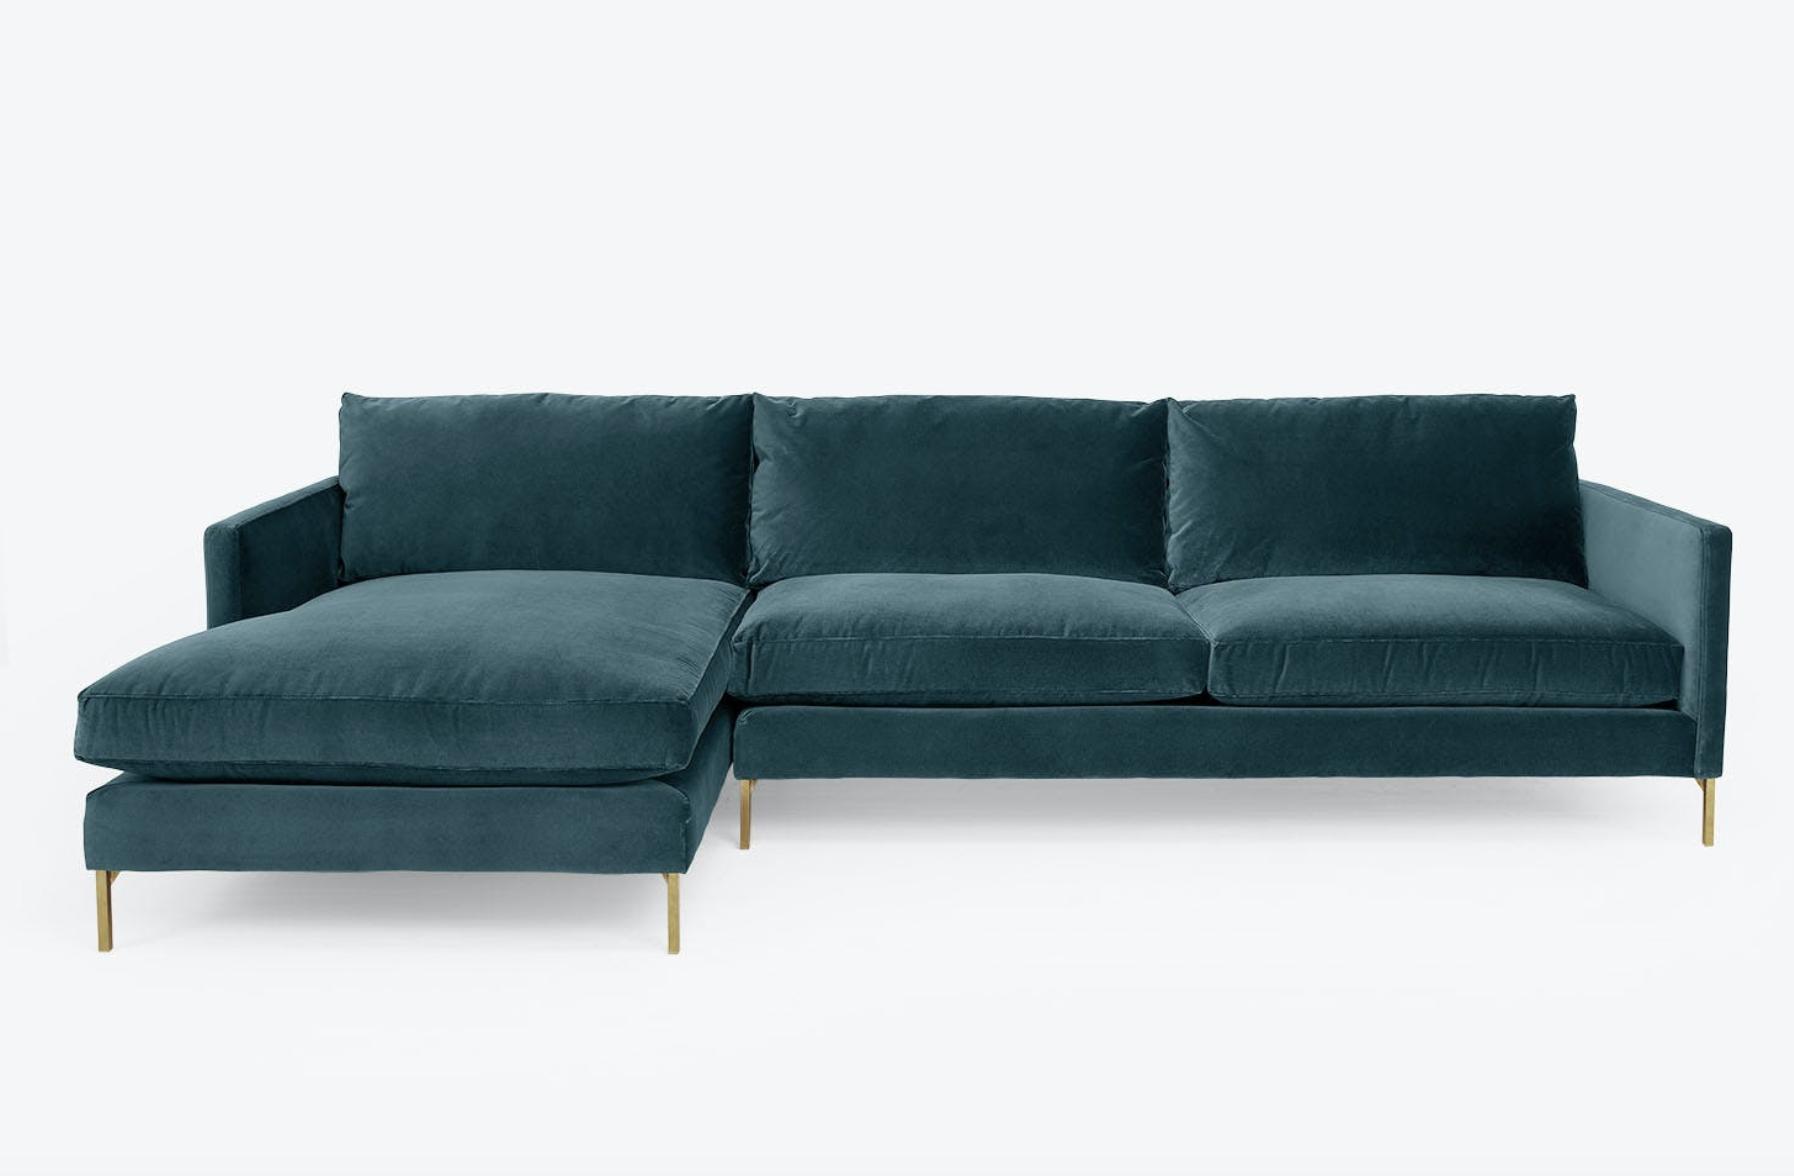 the blue sofa